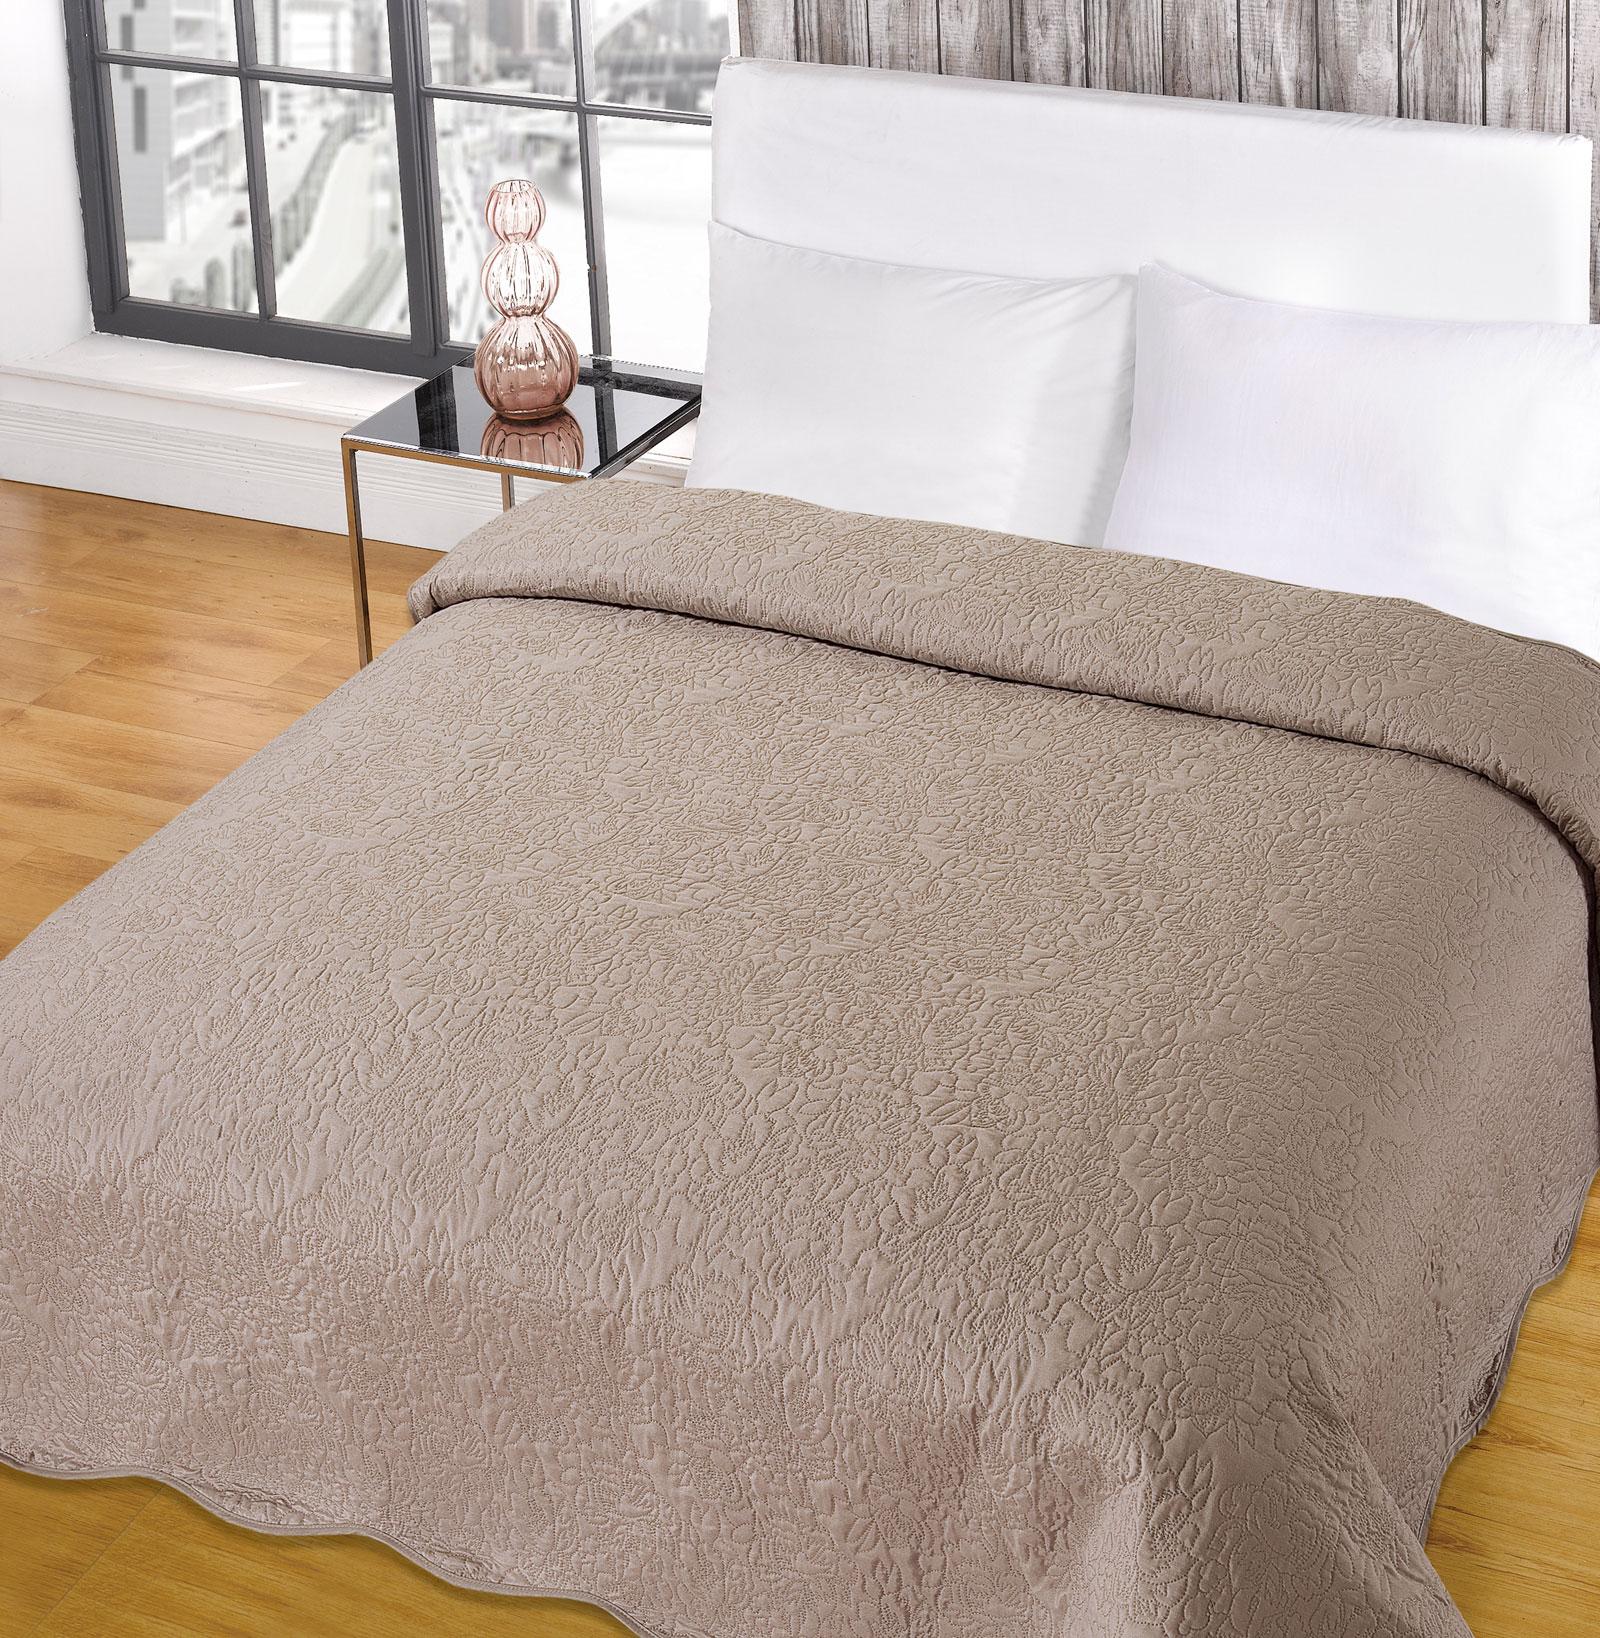 luxurious embroidered vintage bedspread comforter blanket throw duck egg white ebay. Black Bedroom Furniture Sets. Home Design Ideas